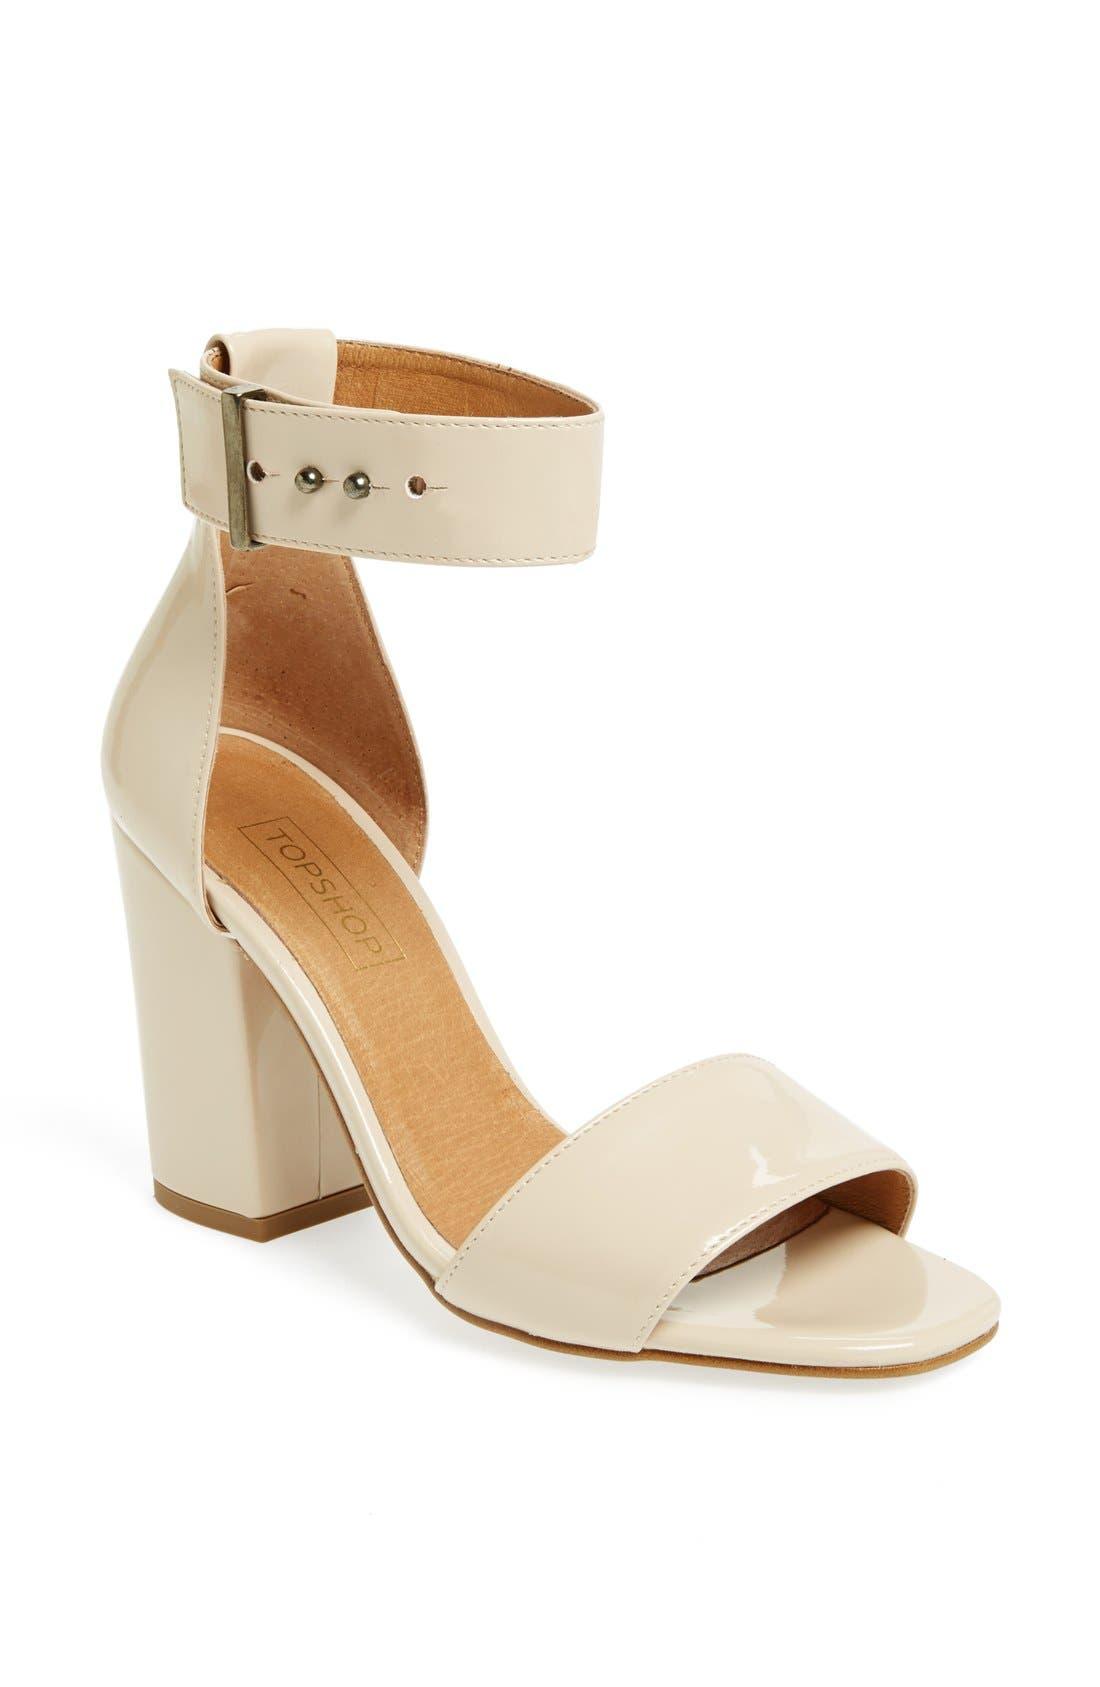 Main Image - Topshop 'Ramble' Sandal